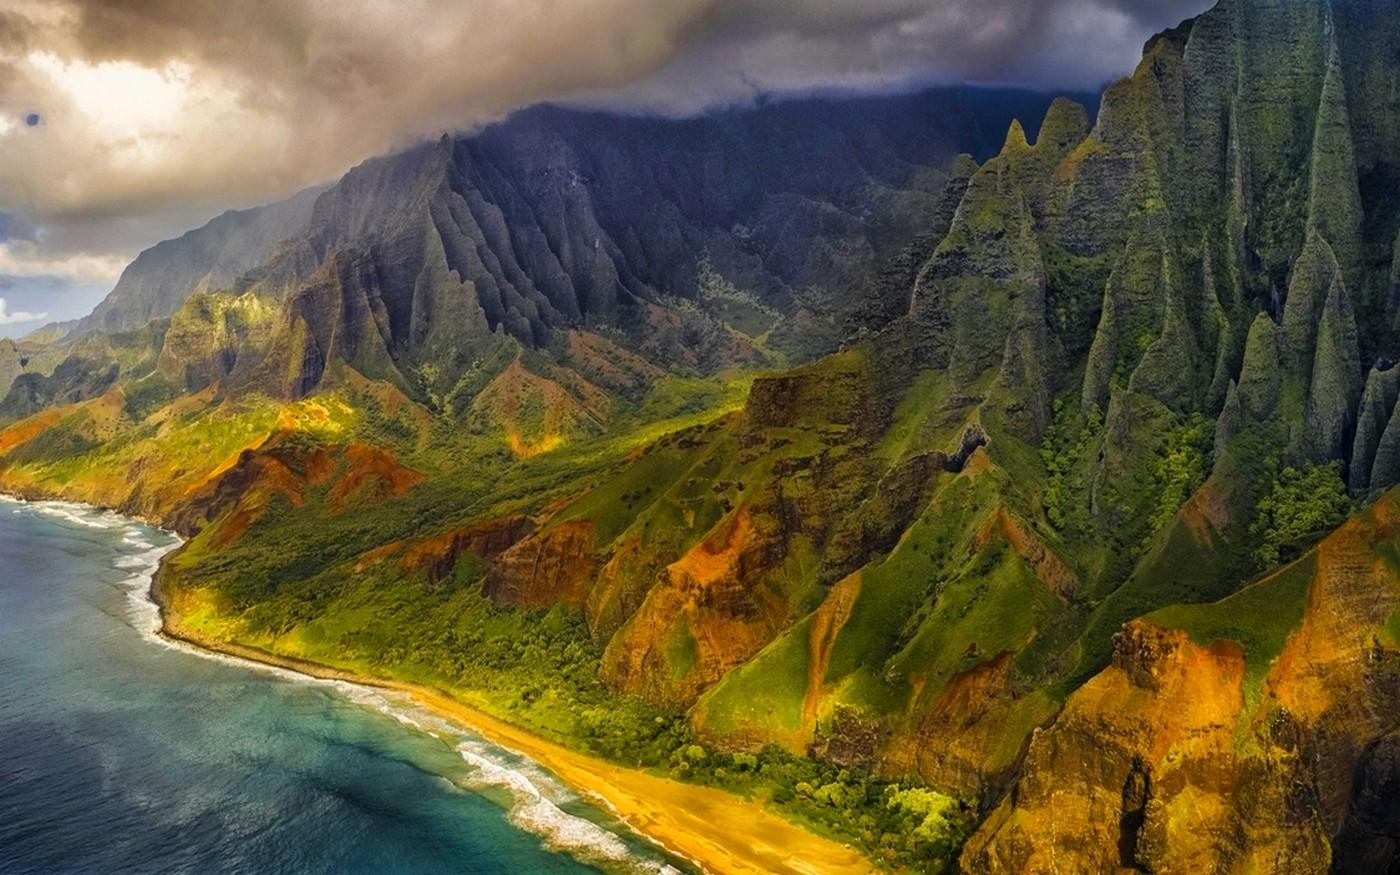 Good Wallpaper Mountain Beach - nature_landscape_aerial_view_mountains_beach_sea_cliff_clouds-66327  Trends_754660.jpg!d